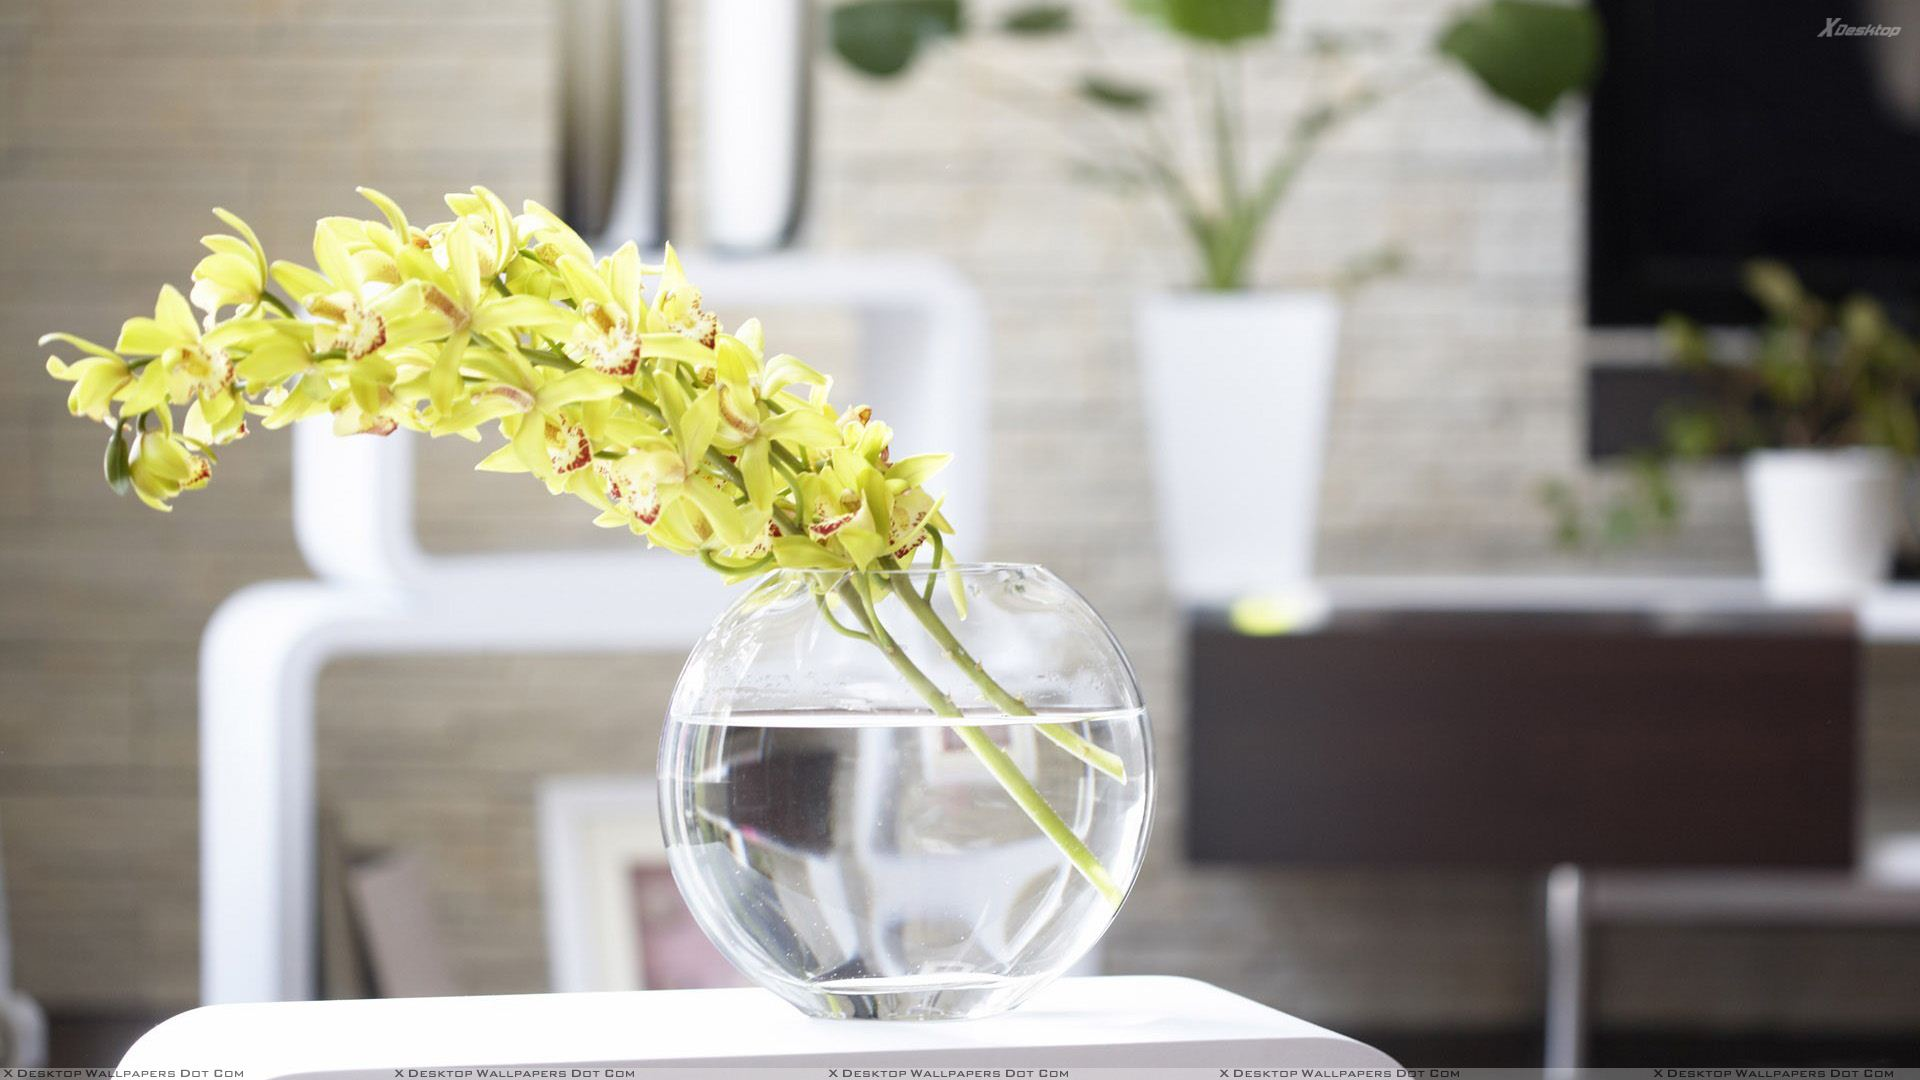 Oriental Floral Display Modern Living Interior Design Ideas